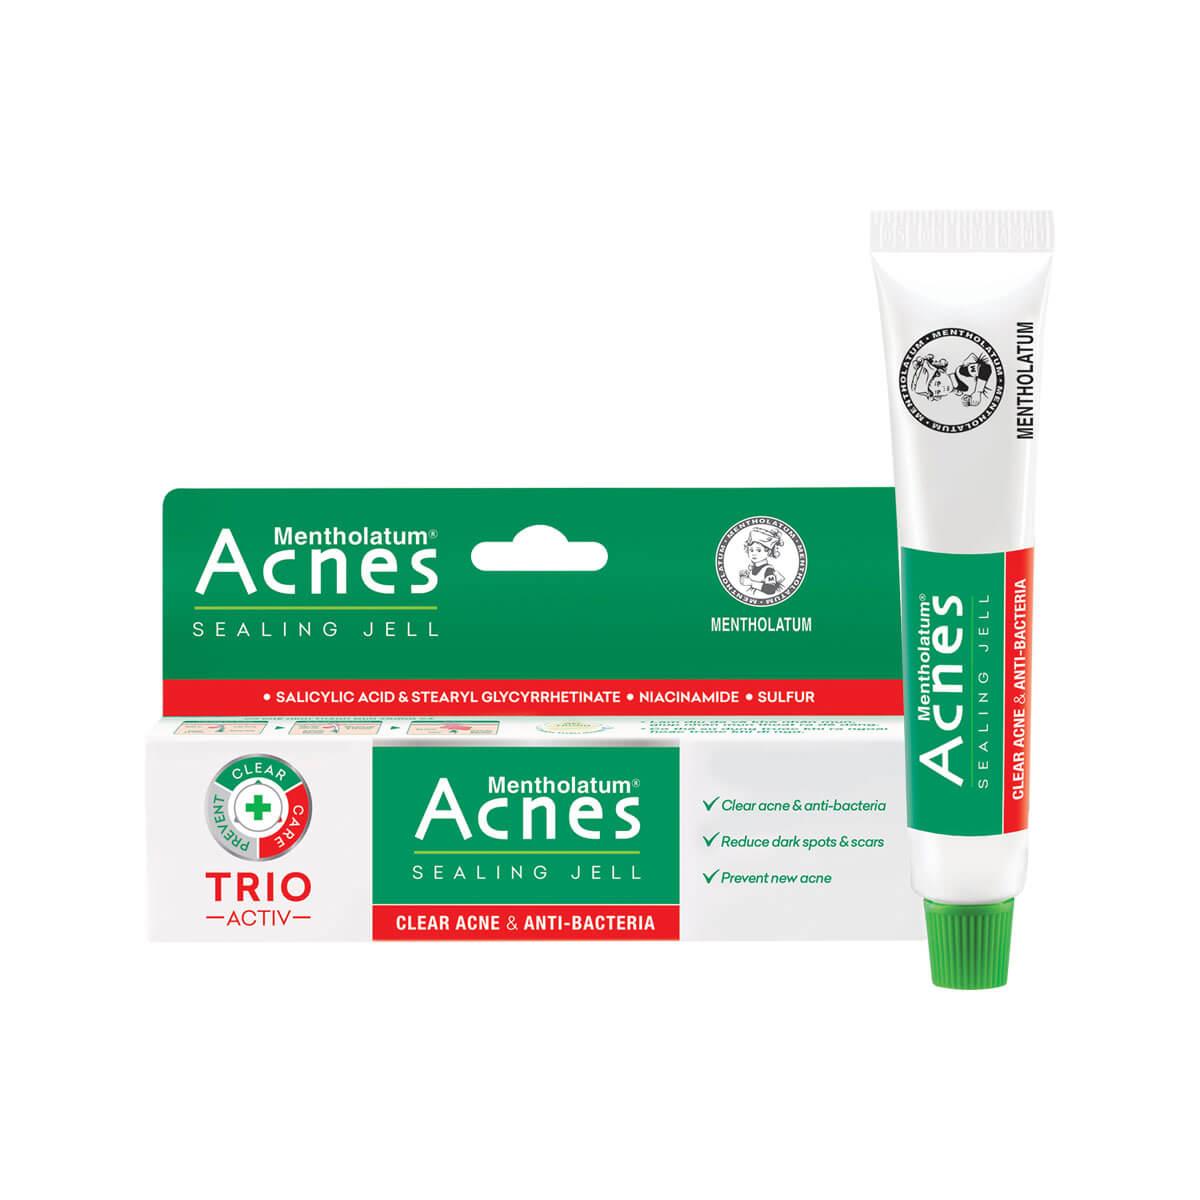 Gel trị mụn Acnes Sealing Jell mờ thêm sẹo